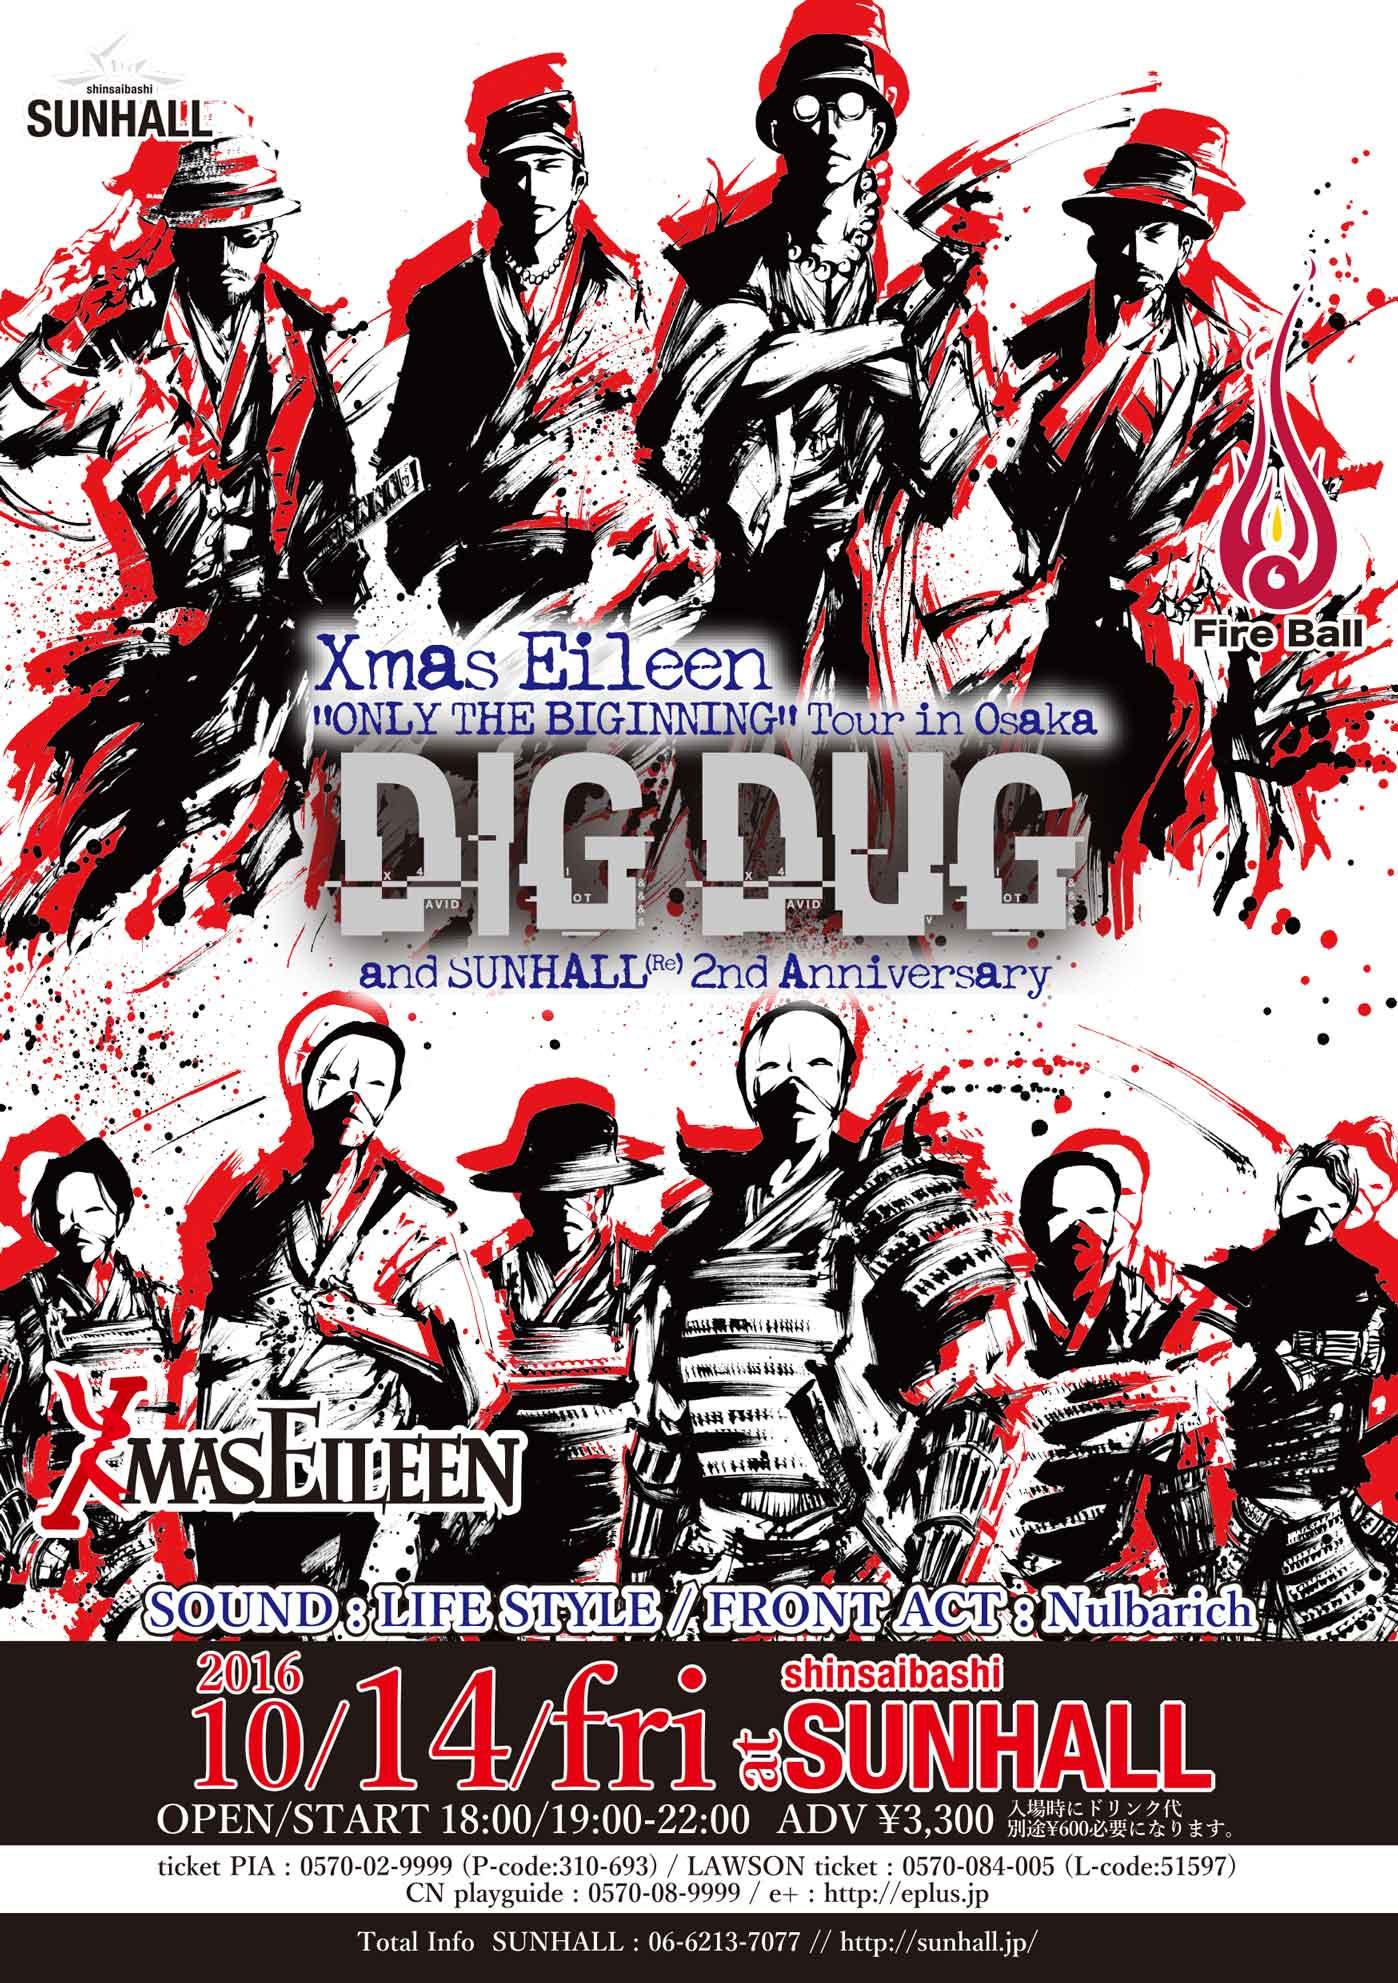 "Xmas Eileen""ONLY THE BIGINING"" Tour Osaka & SUNHALL(Re)  2nd Anniversary 『DIG DUG』"